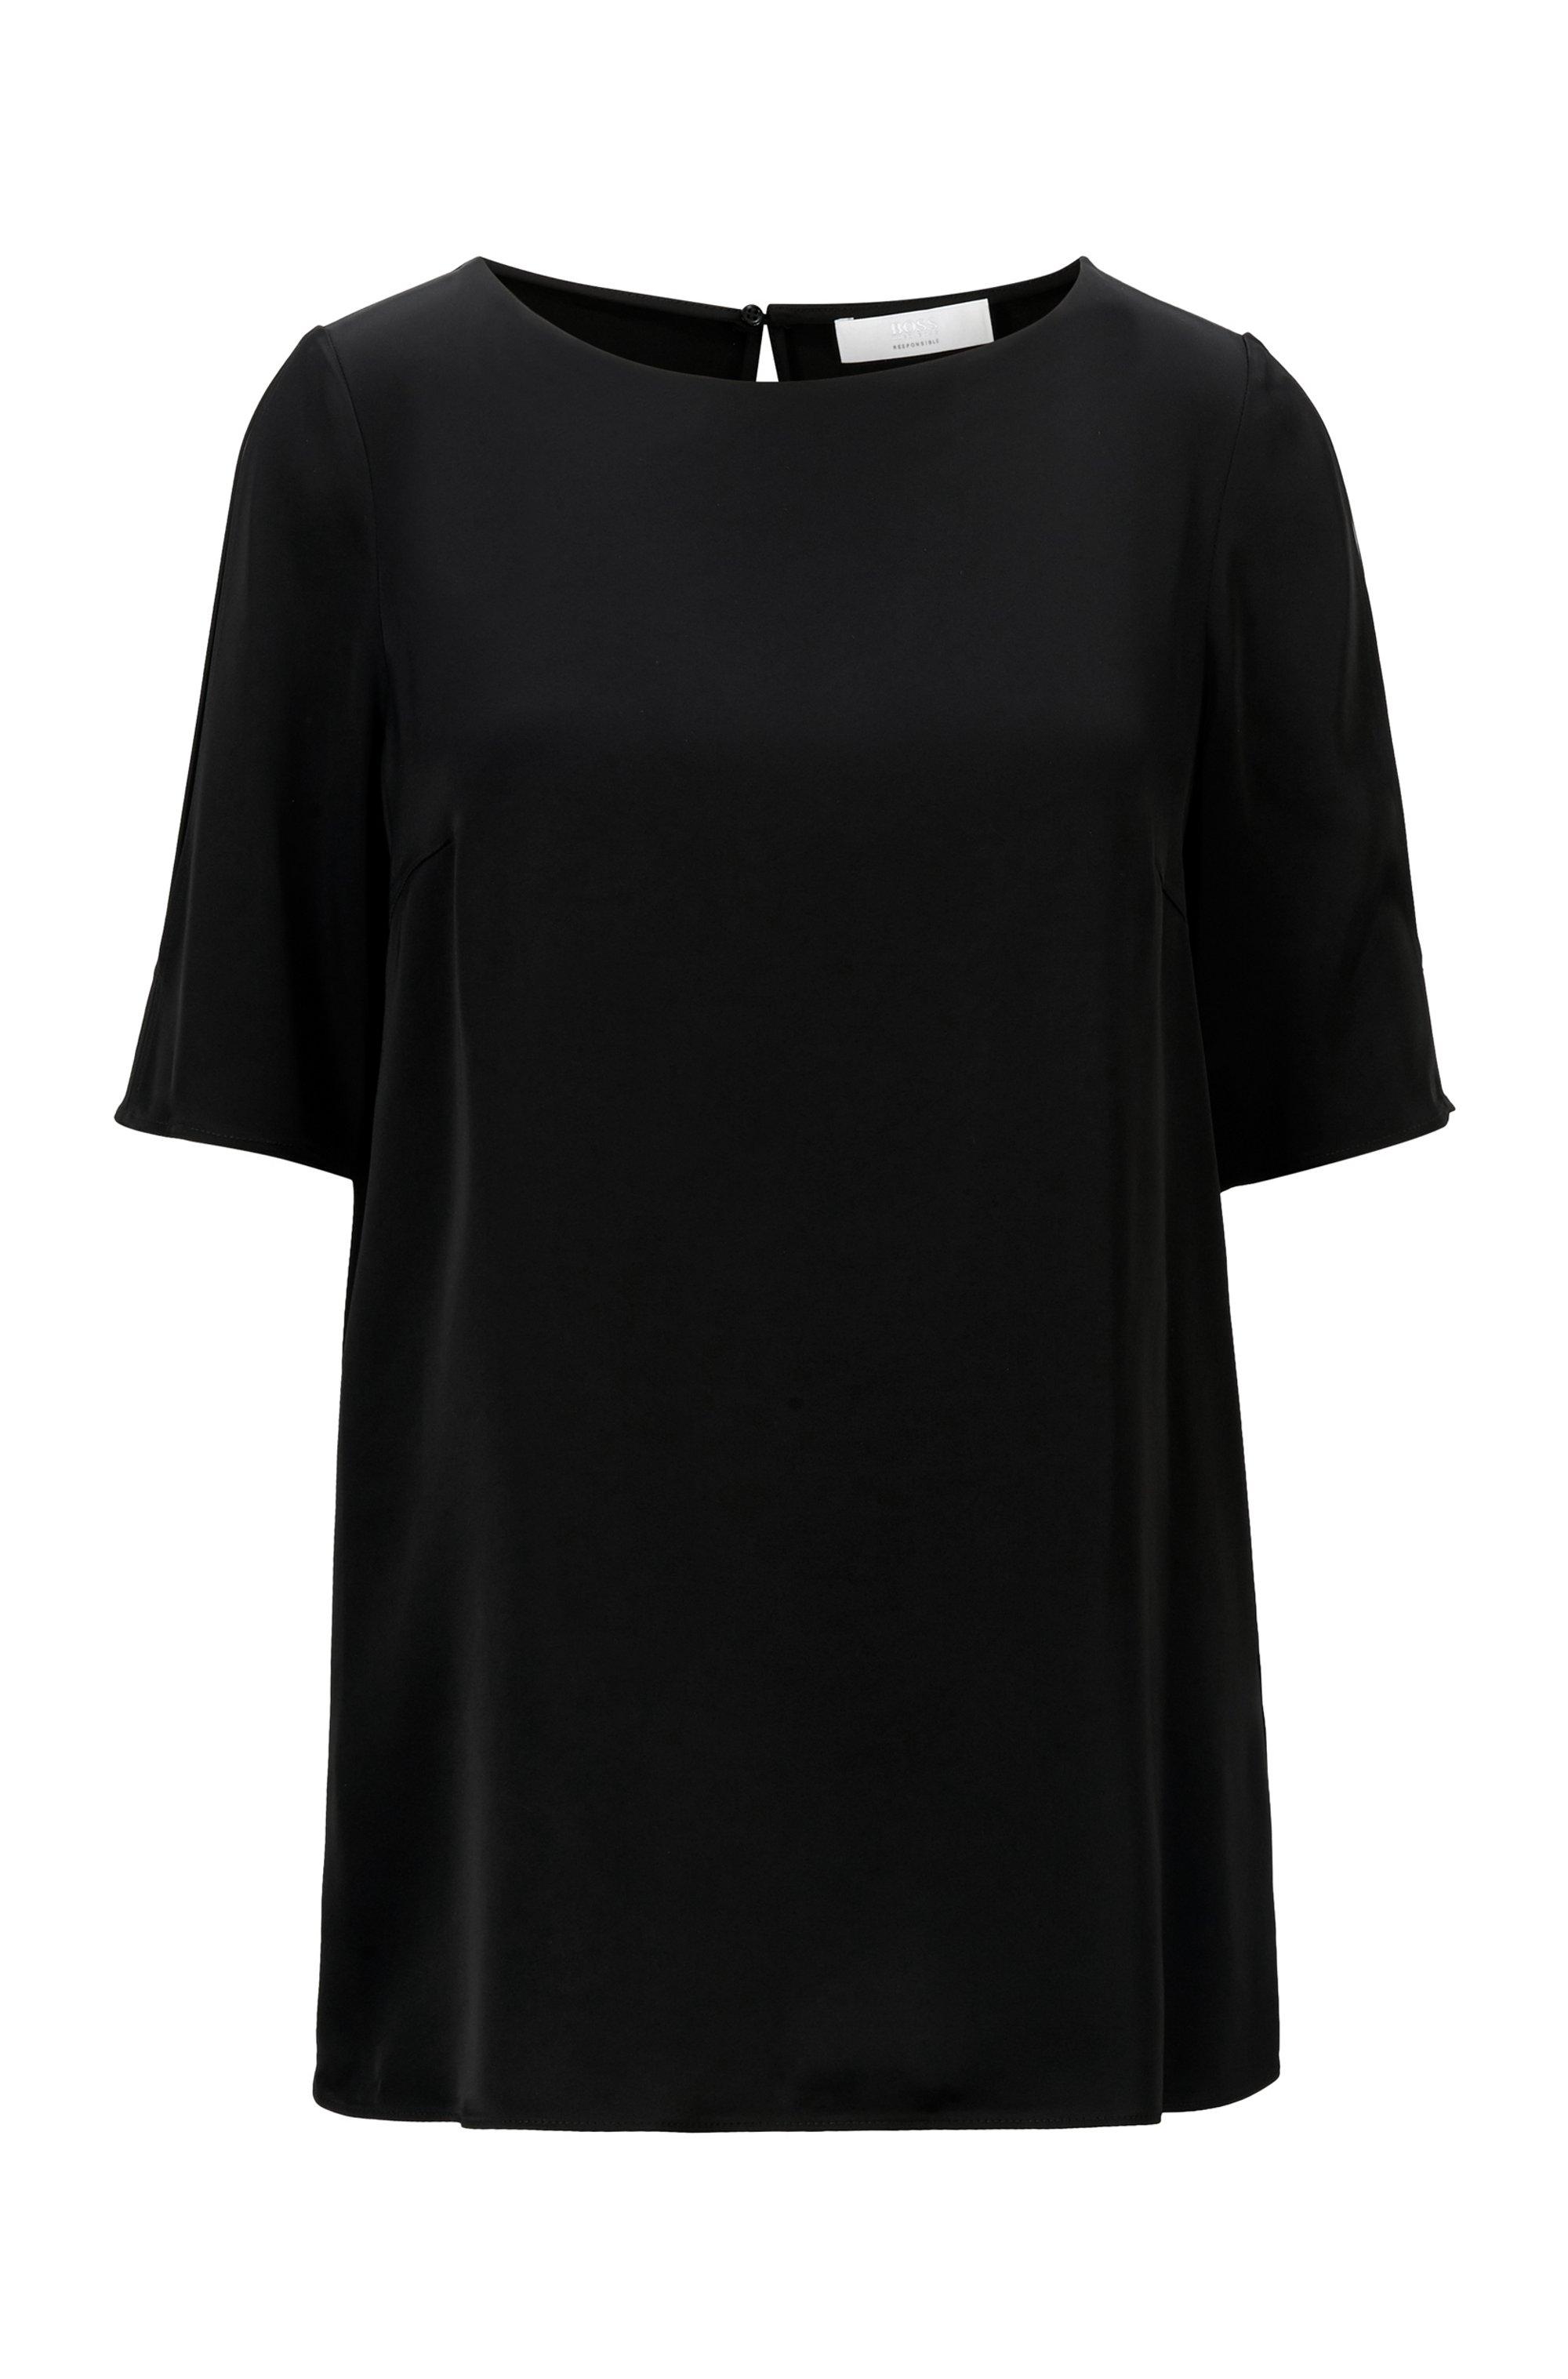 Regular-fit top in satin fabric with shoulder slits, Black